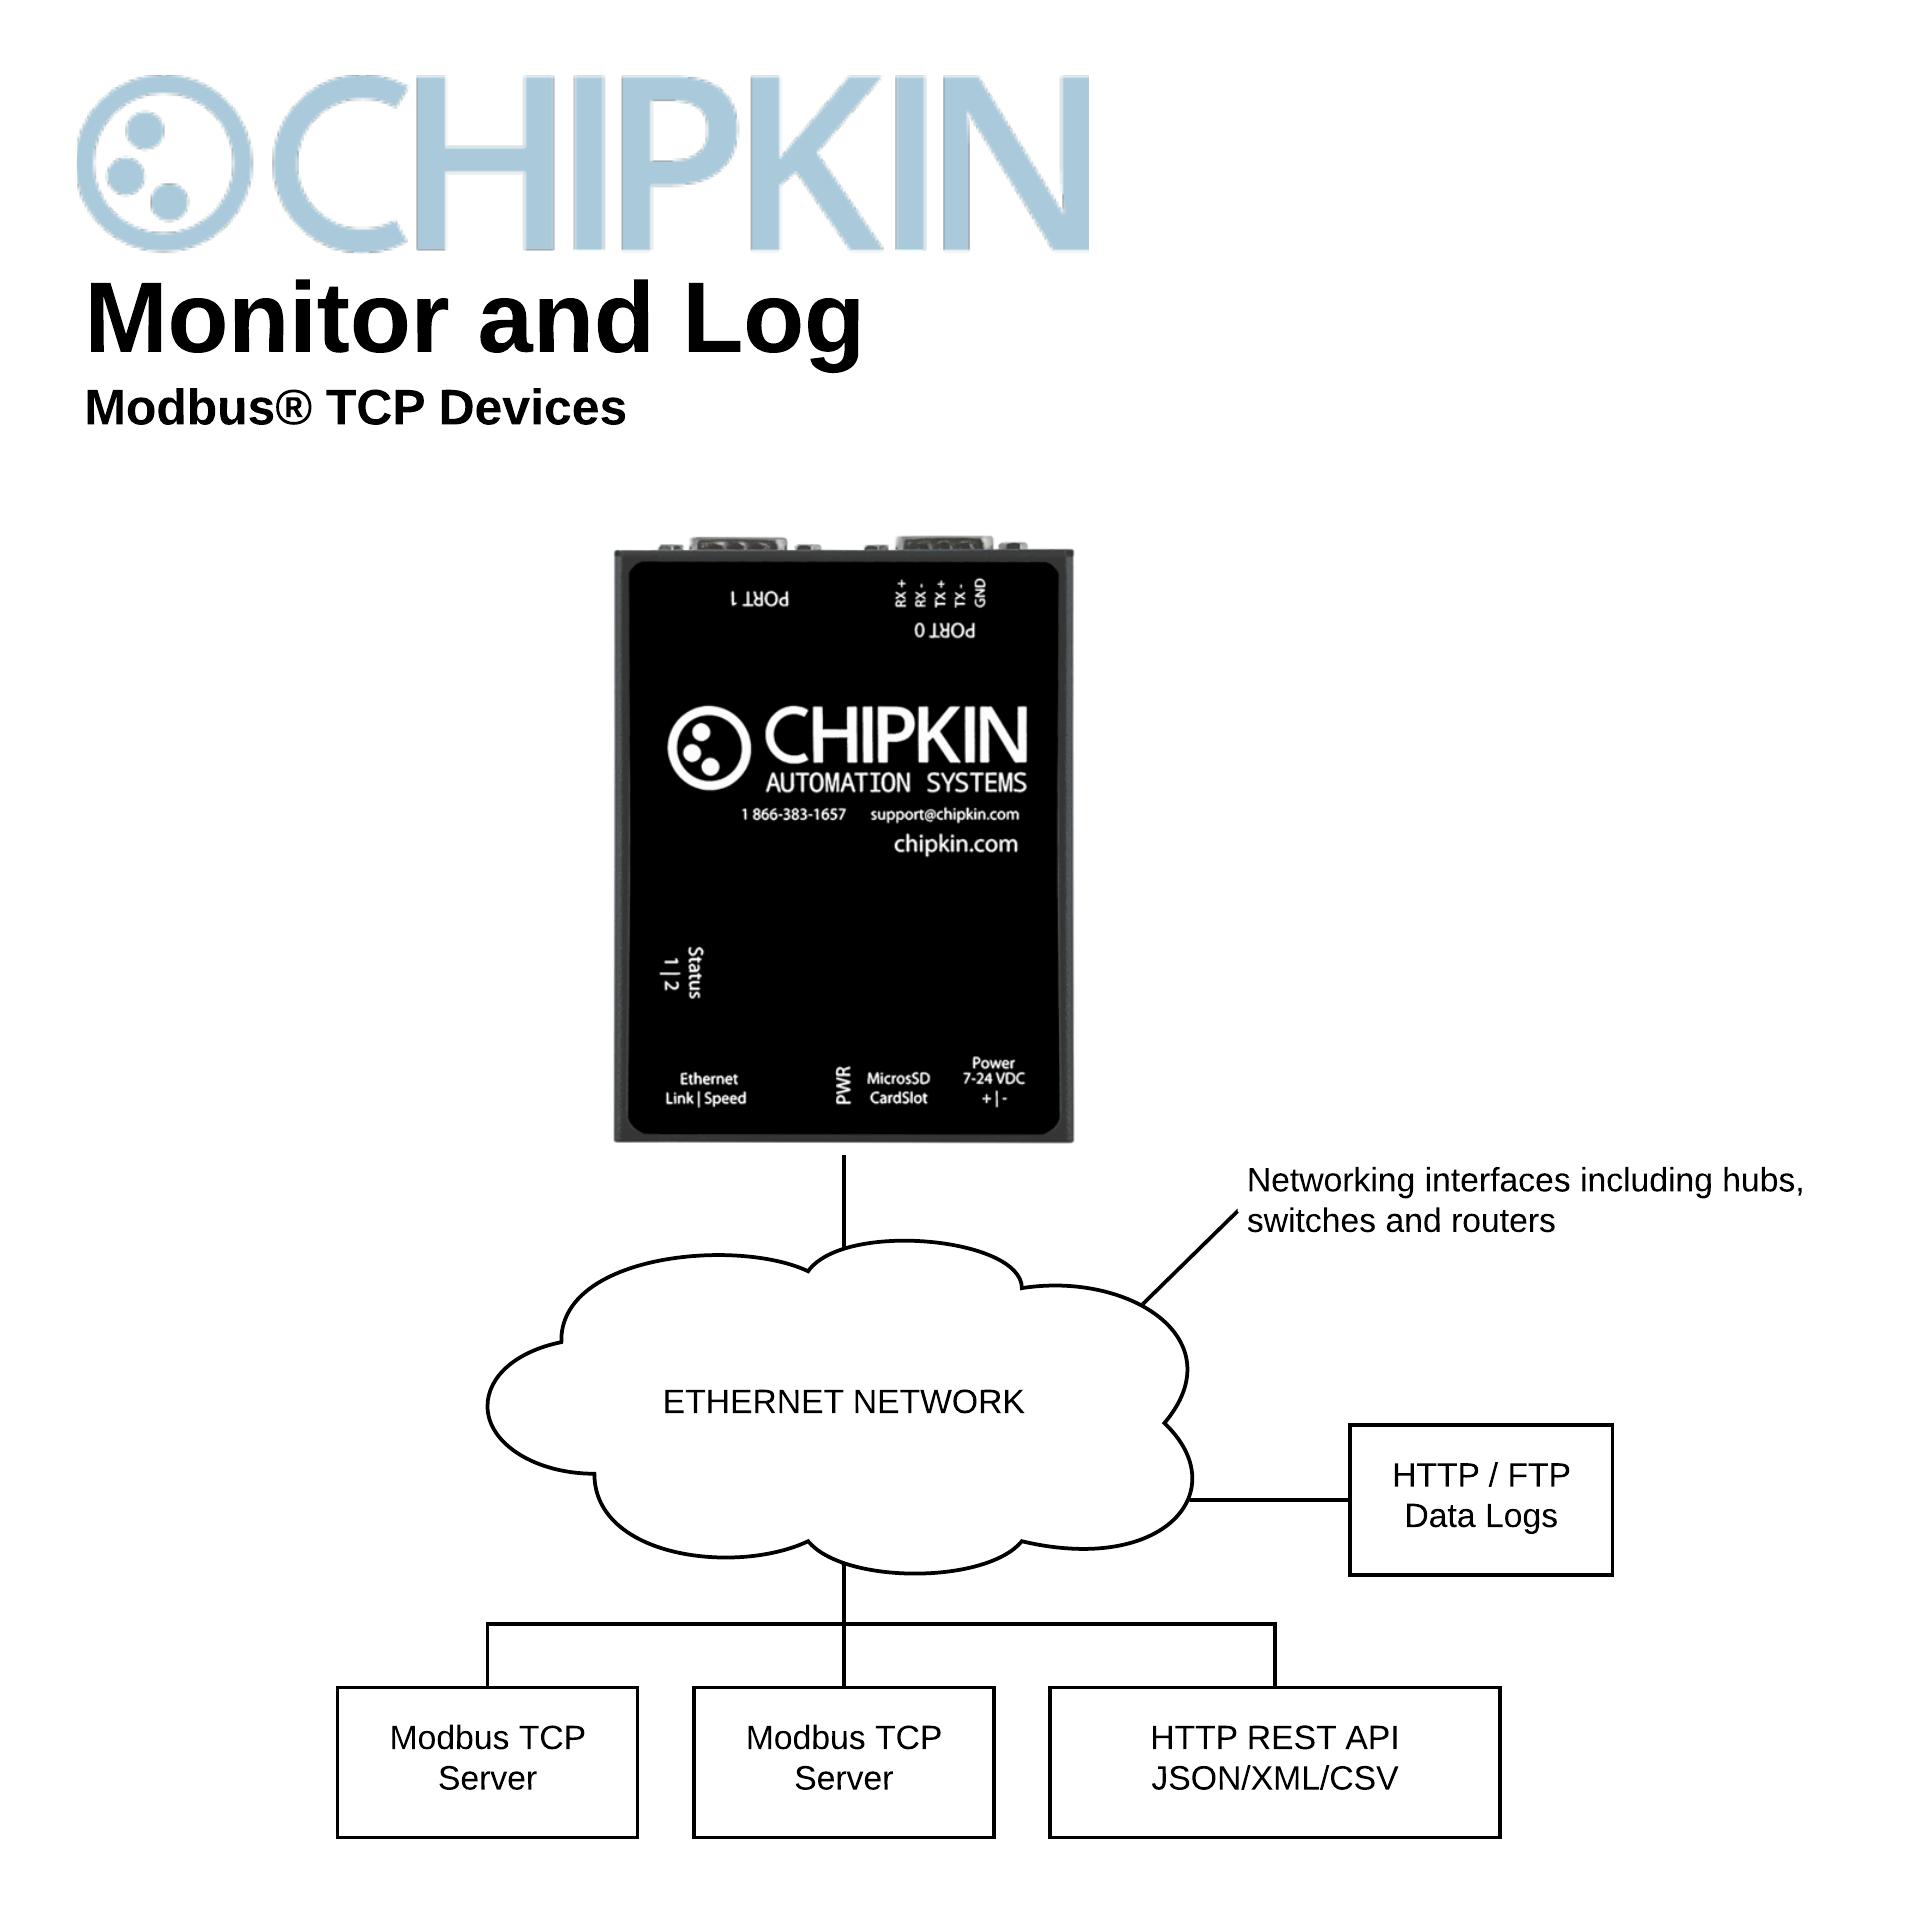 Modbus TCP Data Client/Logger